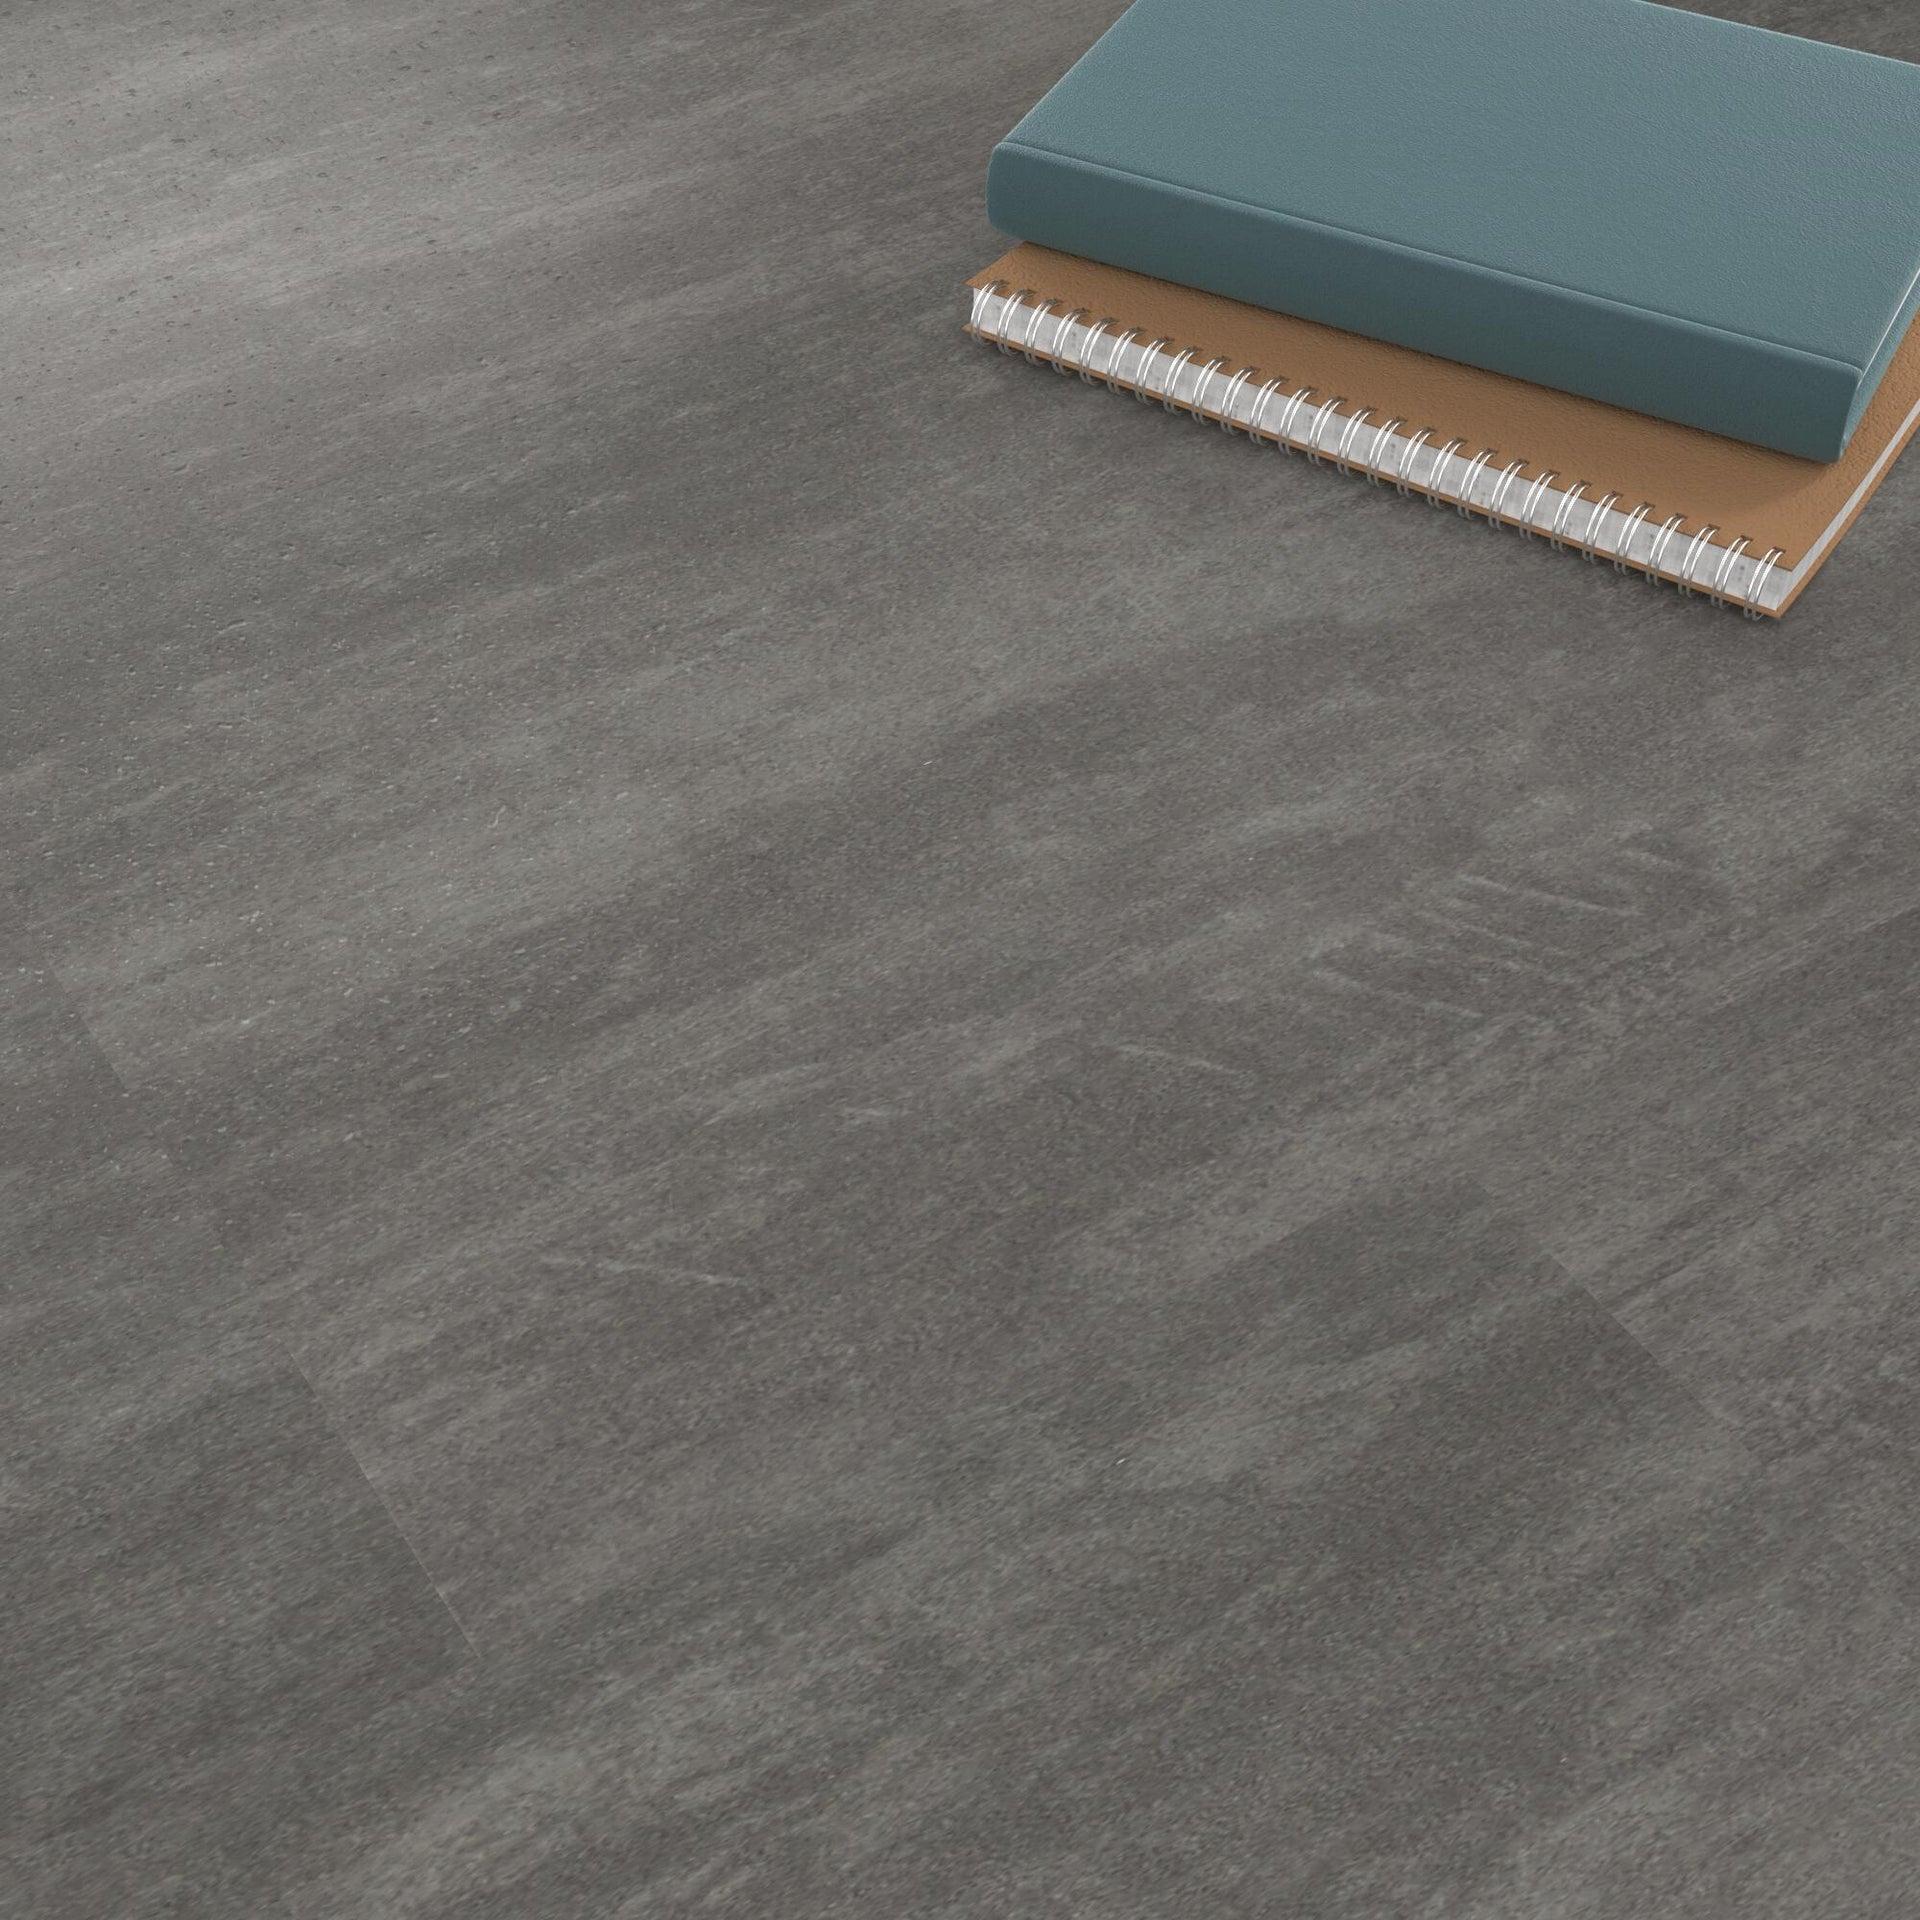 Pavimento PVC incastro Tolu Sp 4 mm grigio / argento - 5